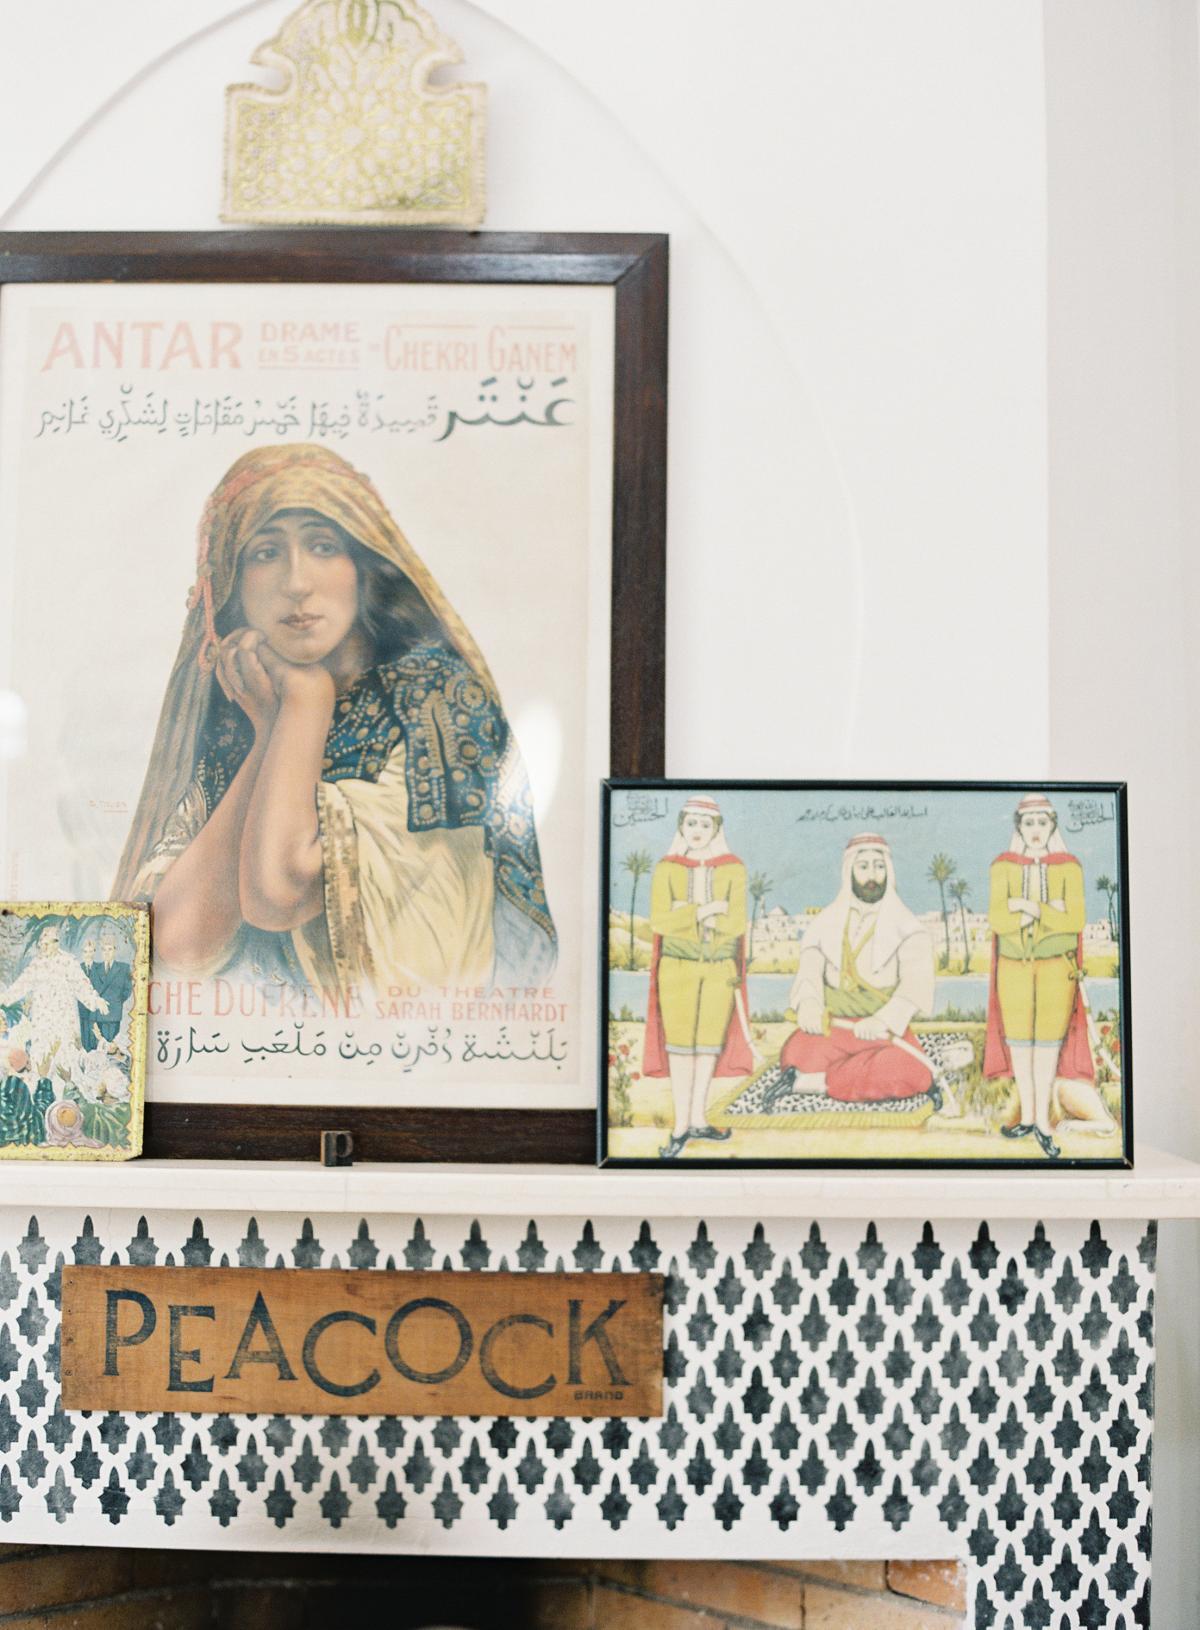 Peacock Pavilions Marrakech Morocco Interiors Photographer Omalley 0009